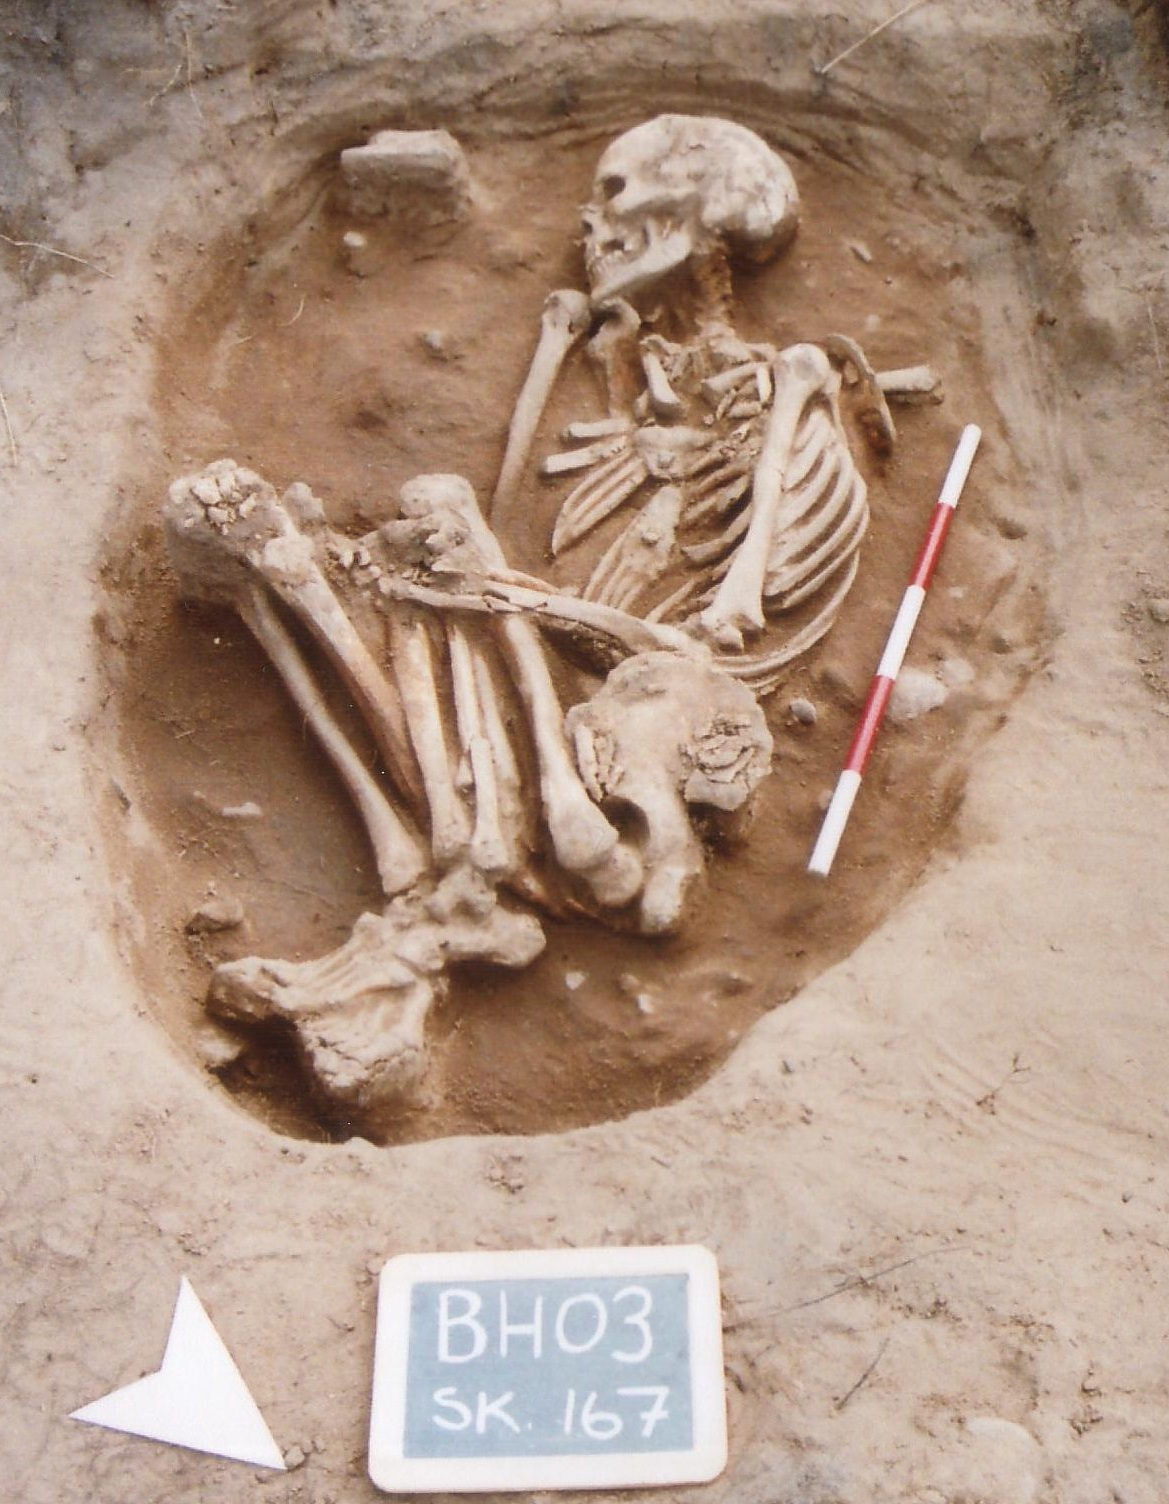 Skeleton been recorded